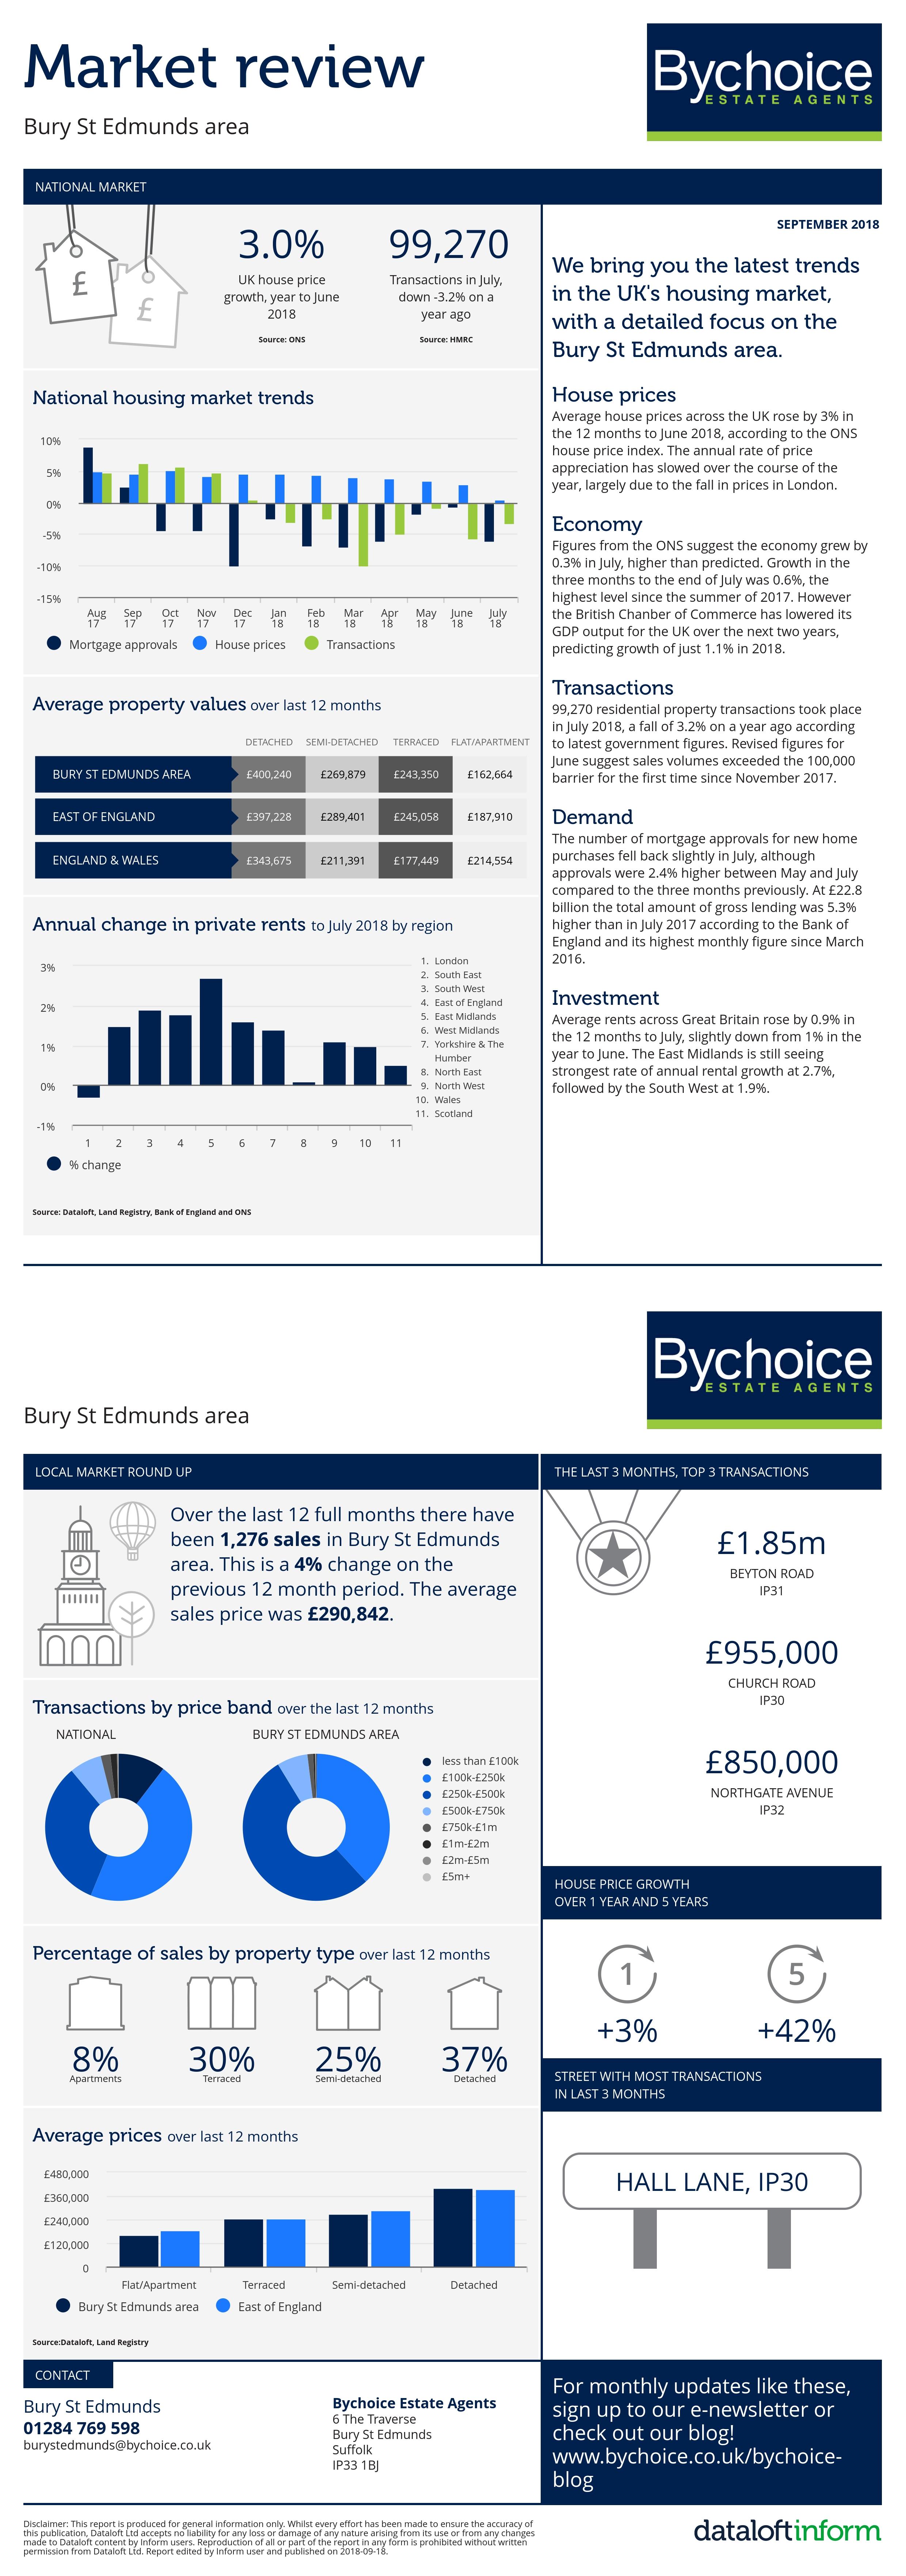 September 2018 Market Review - Bury St Edmunds